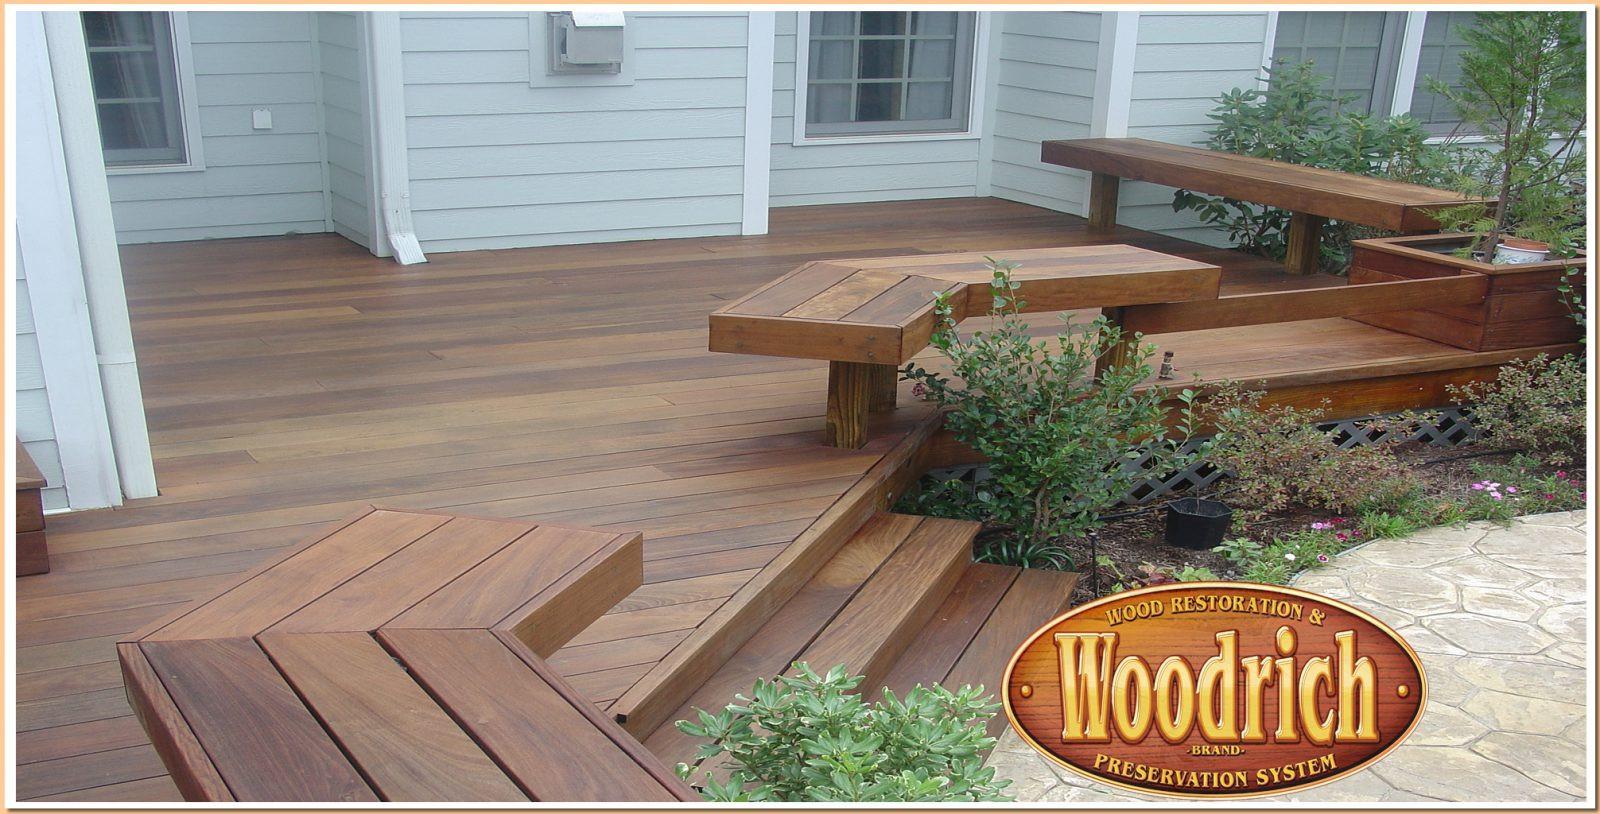 hardwood floor refinishing minneapolis of ipe deck full restoration intended for ipe outdoor decking after 1 1 1600x814